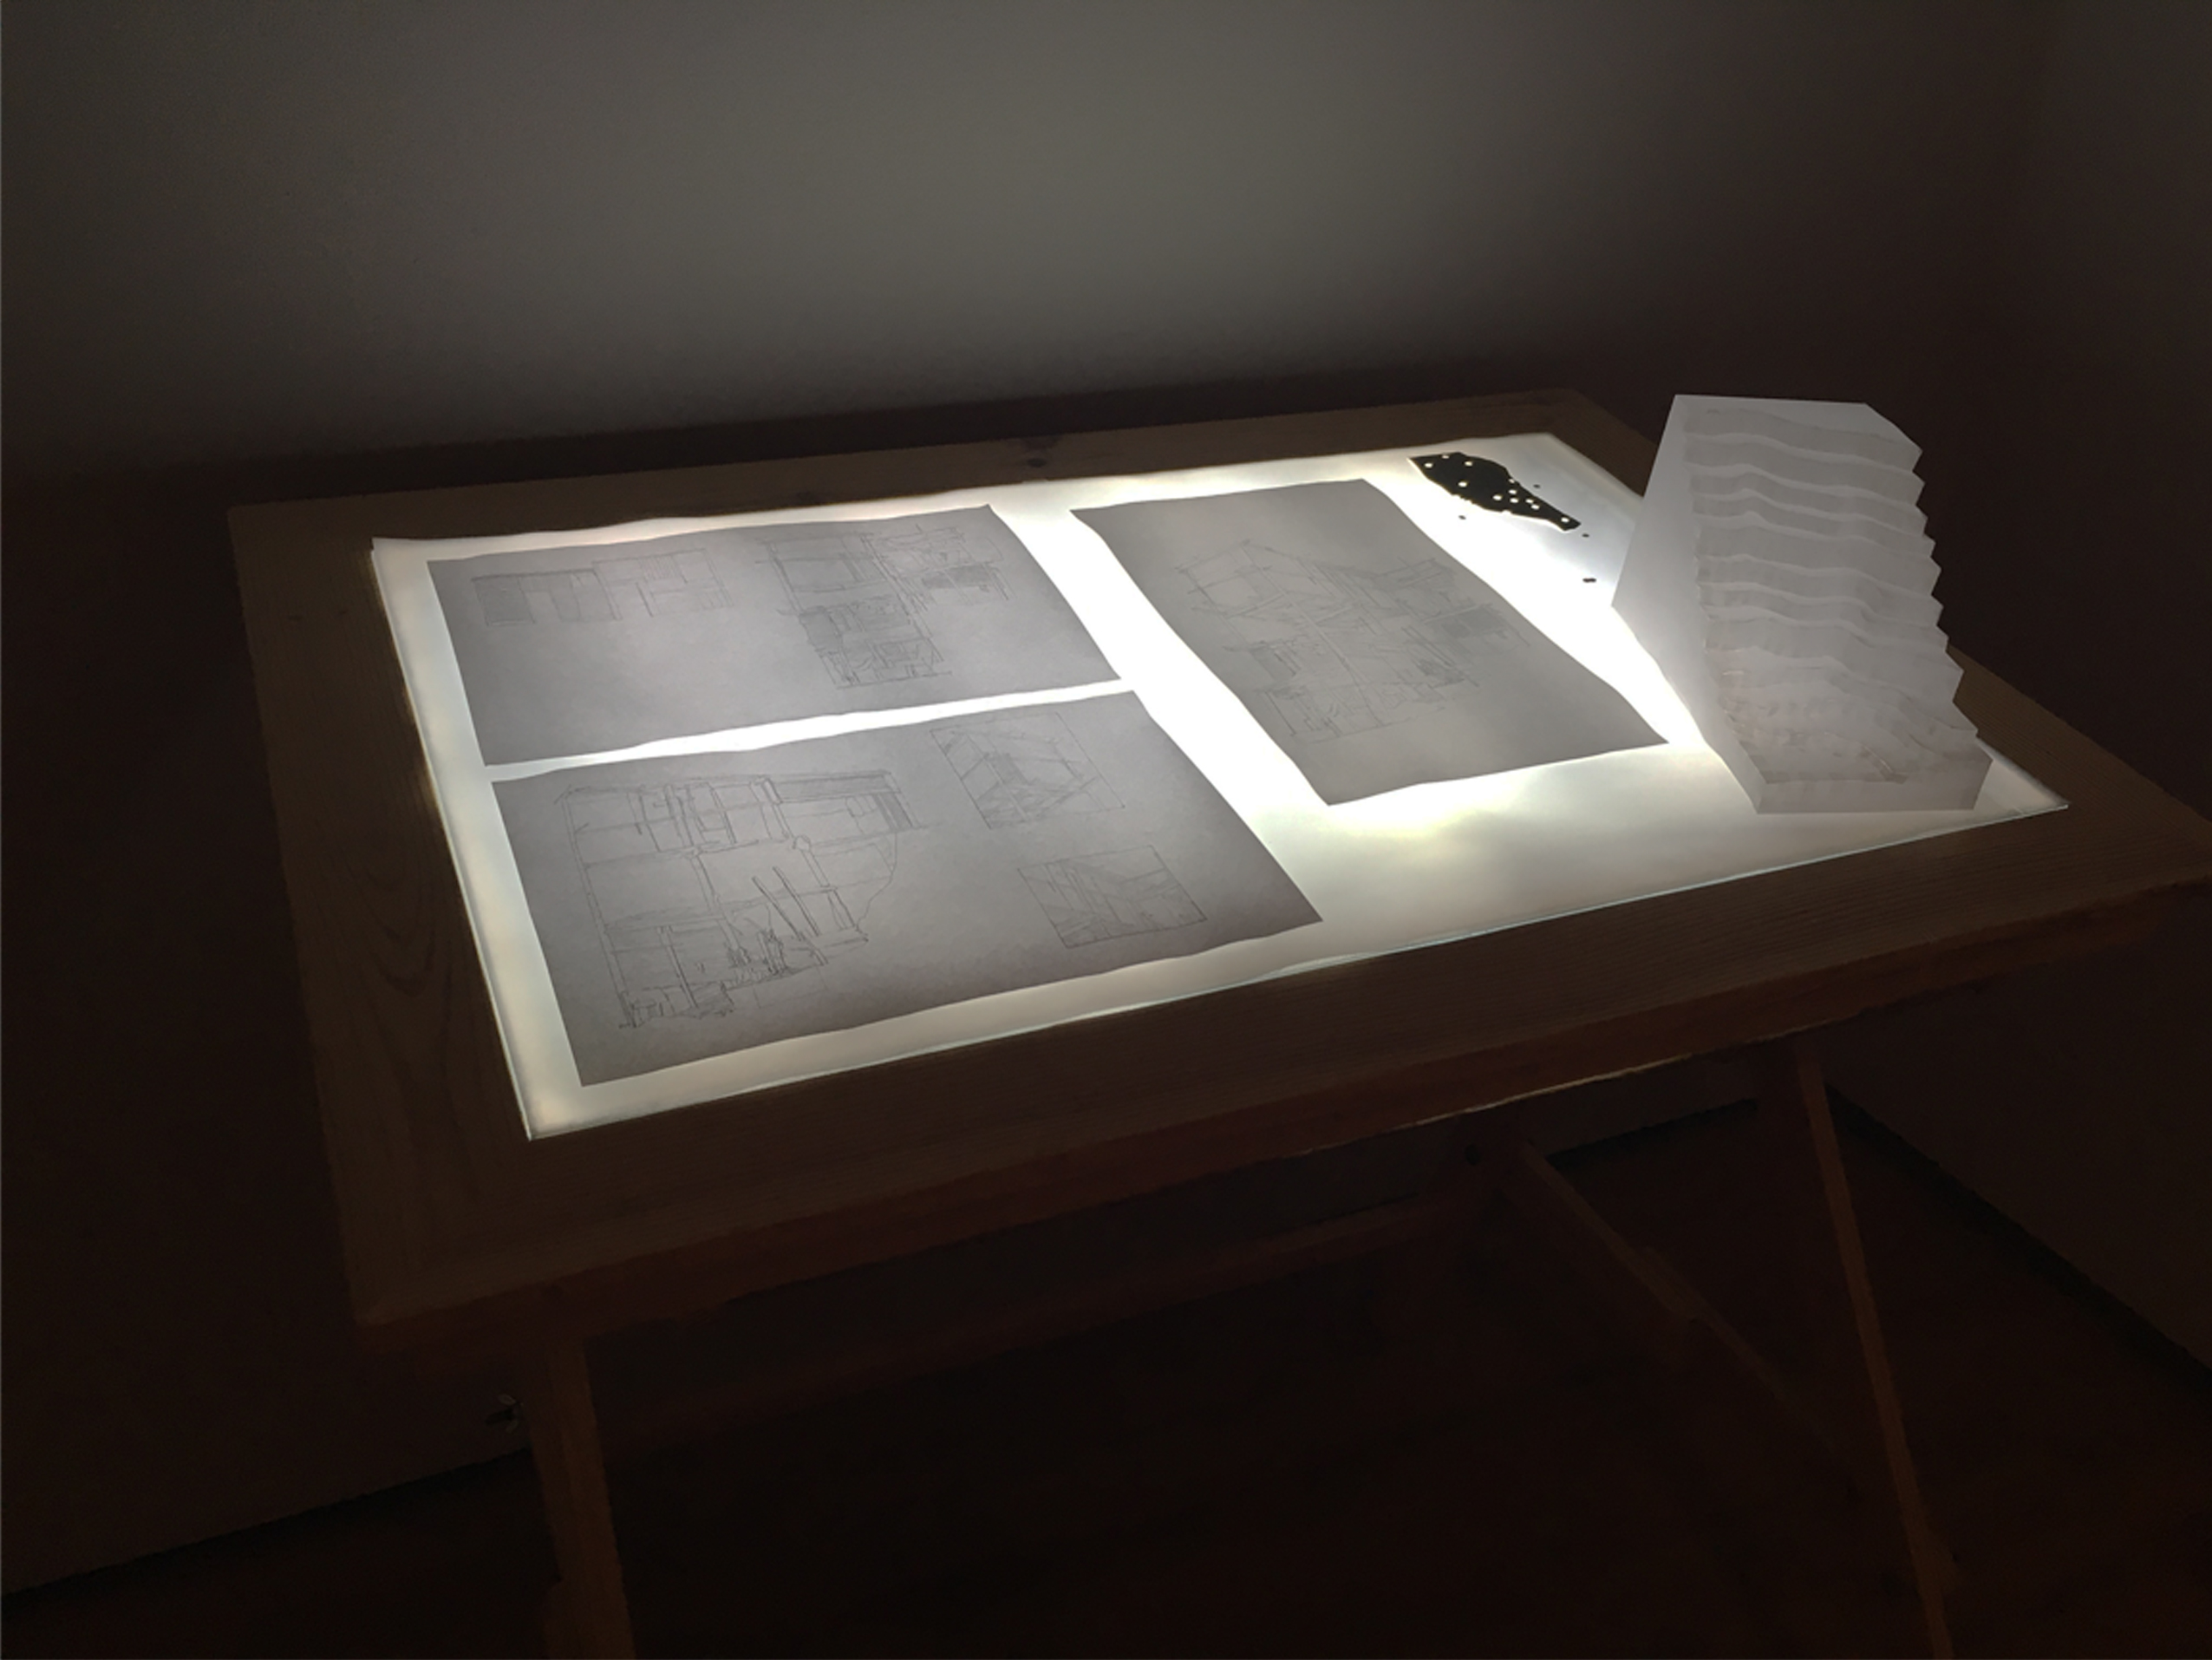 Detalle Arquitecturas leves, 2012. Mesa de luz, impresiones, papel.